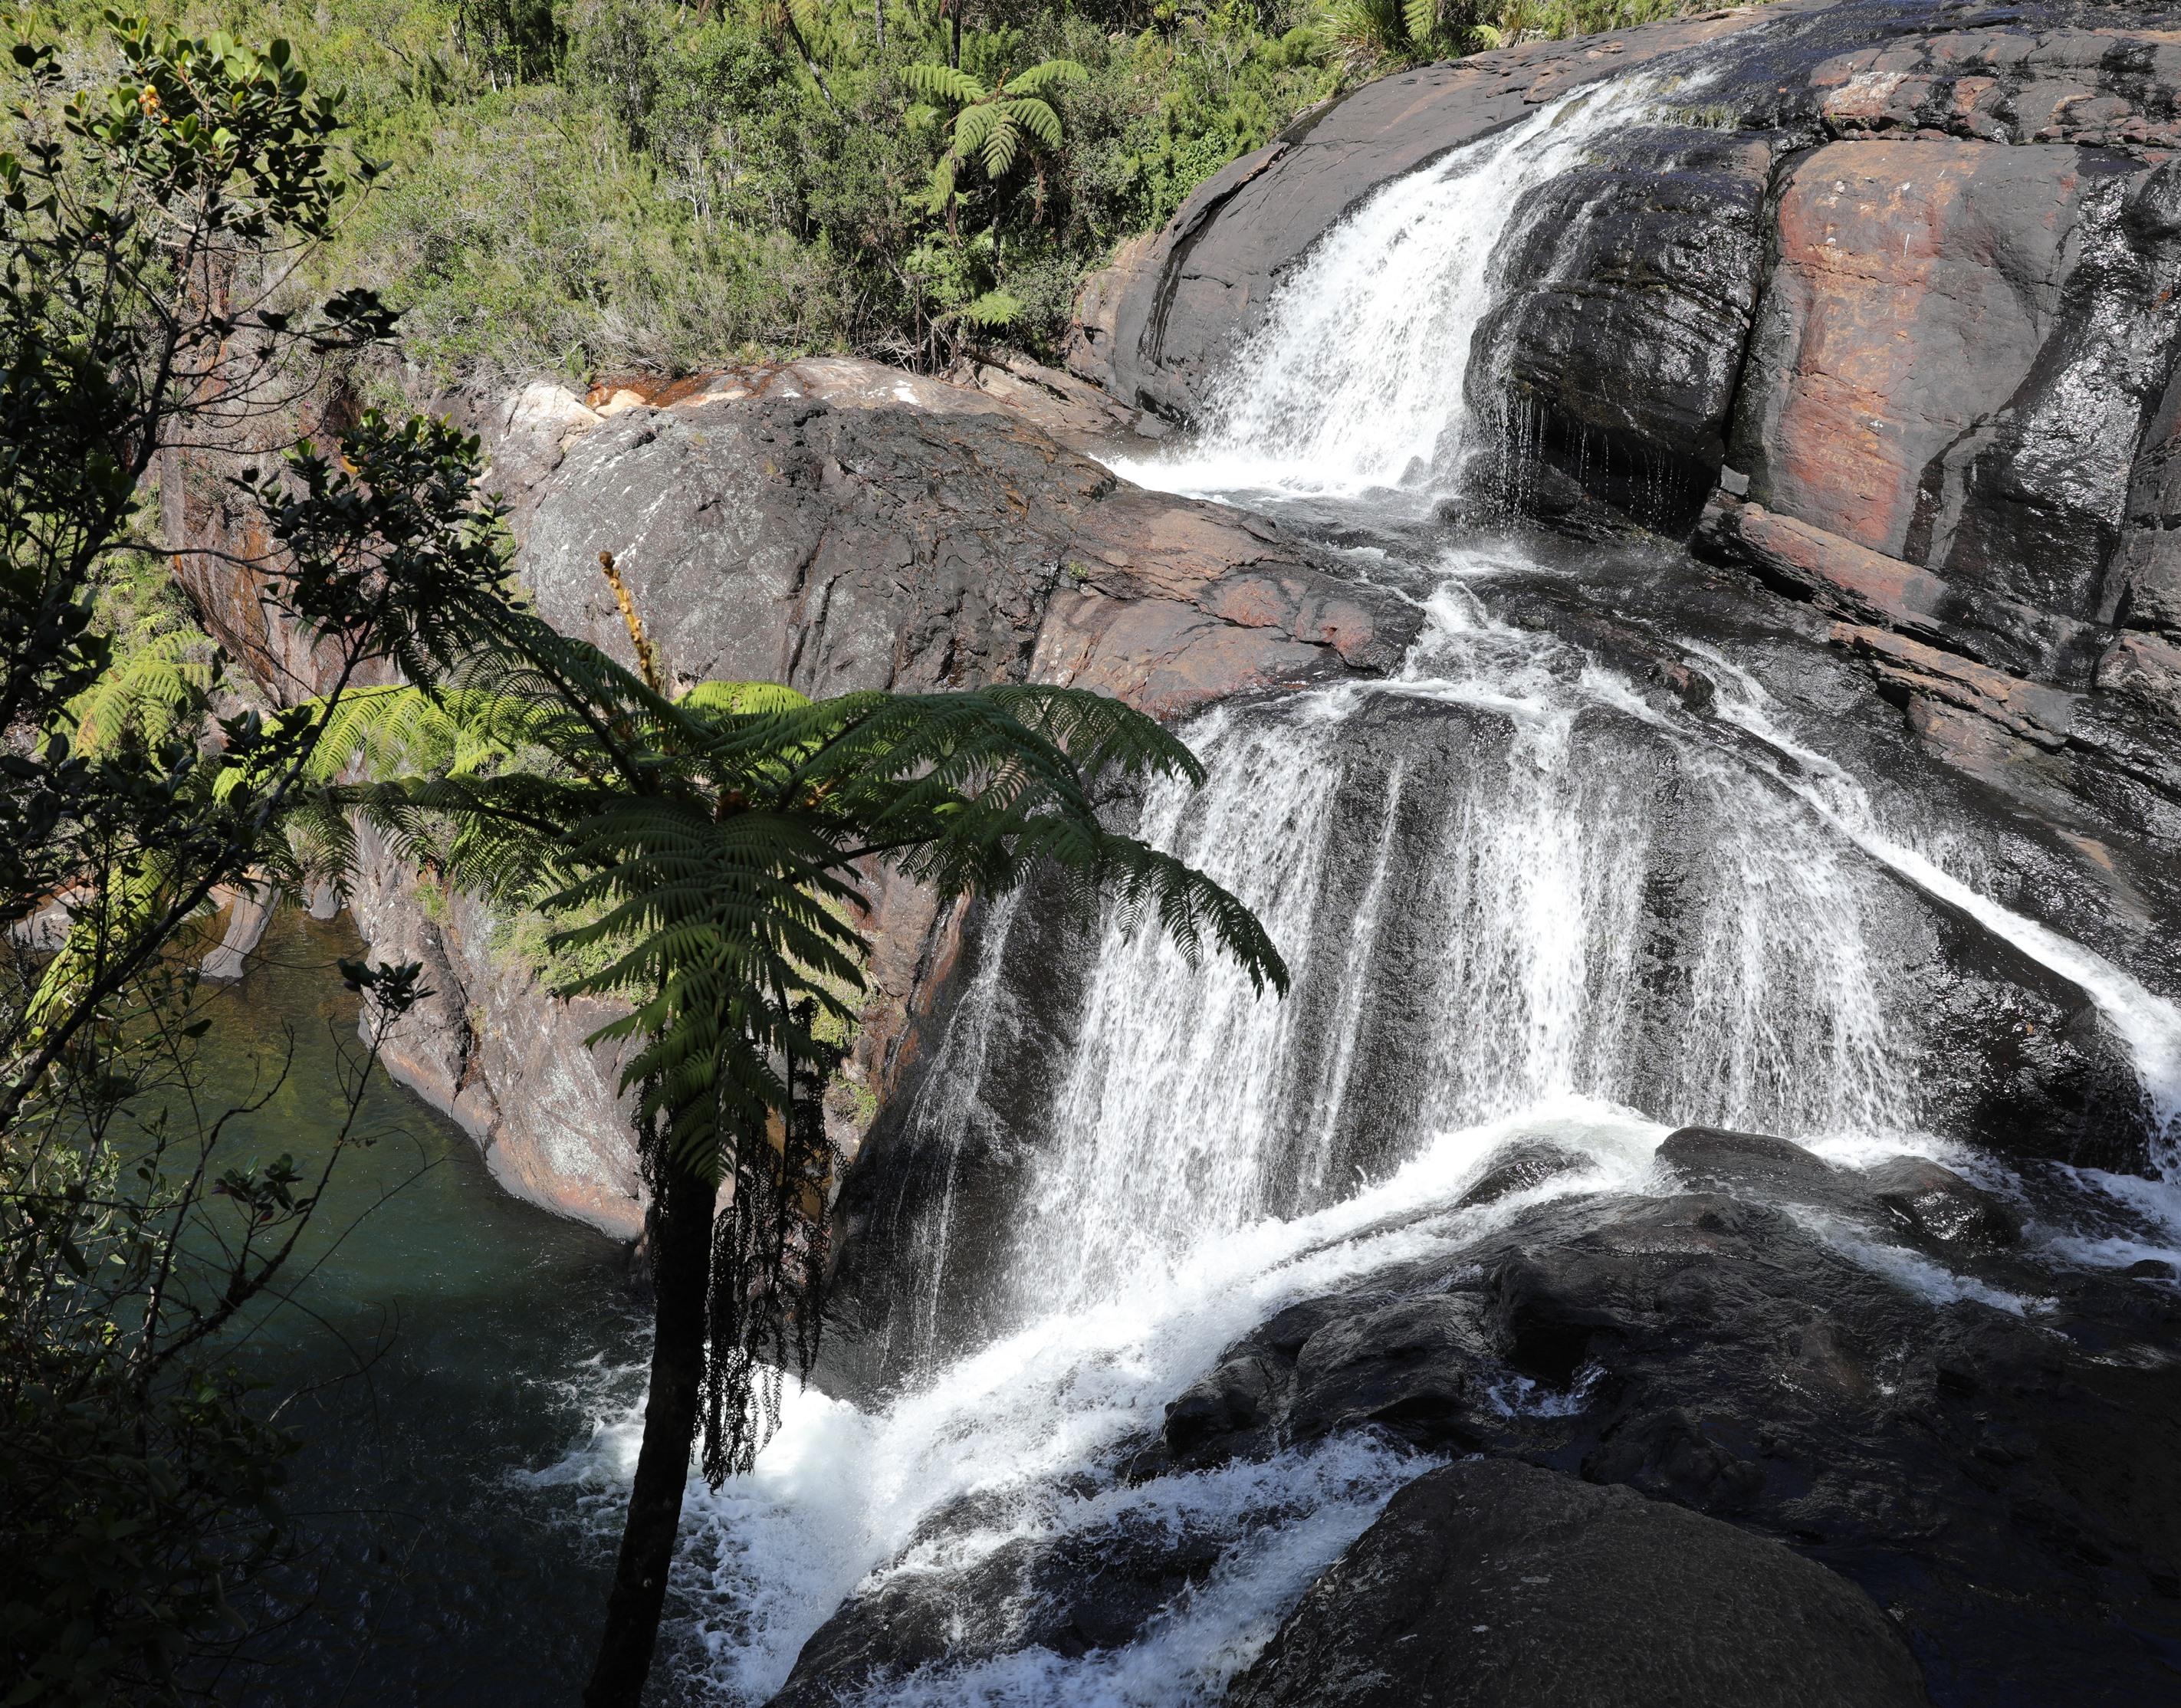 Baker's Falls. Horton Plains